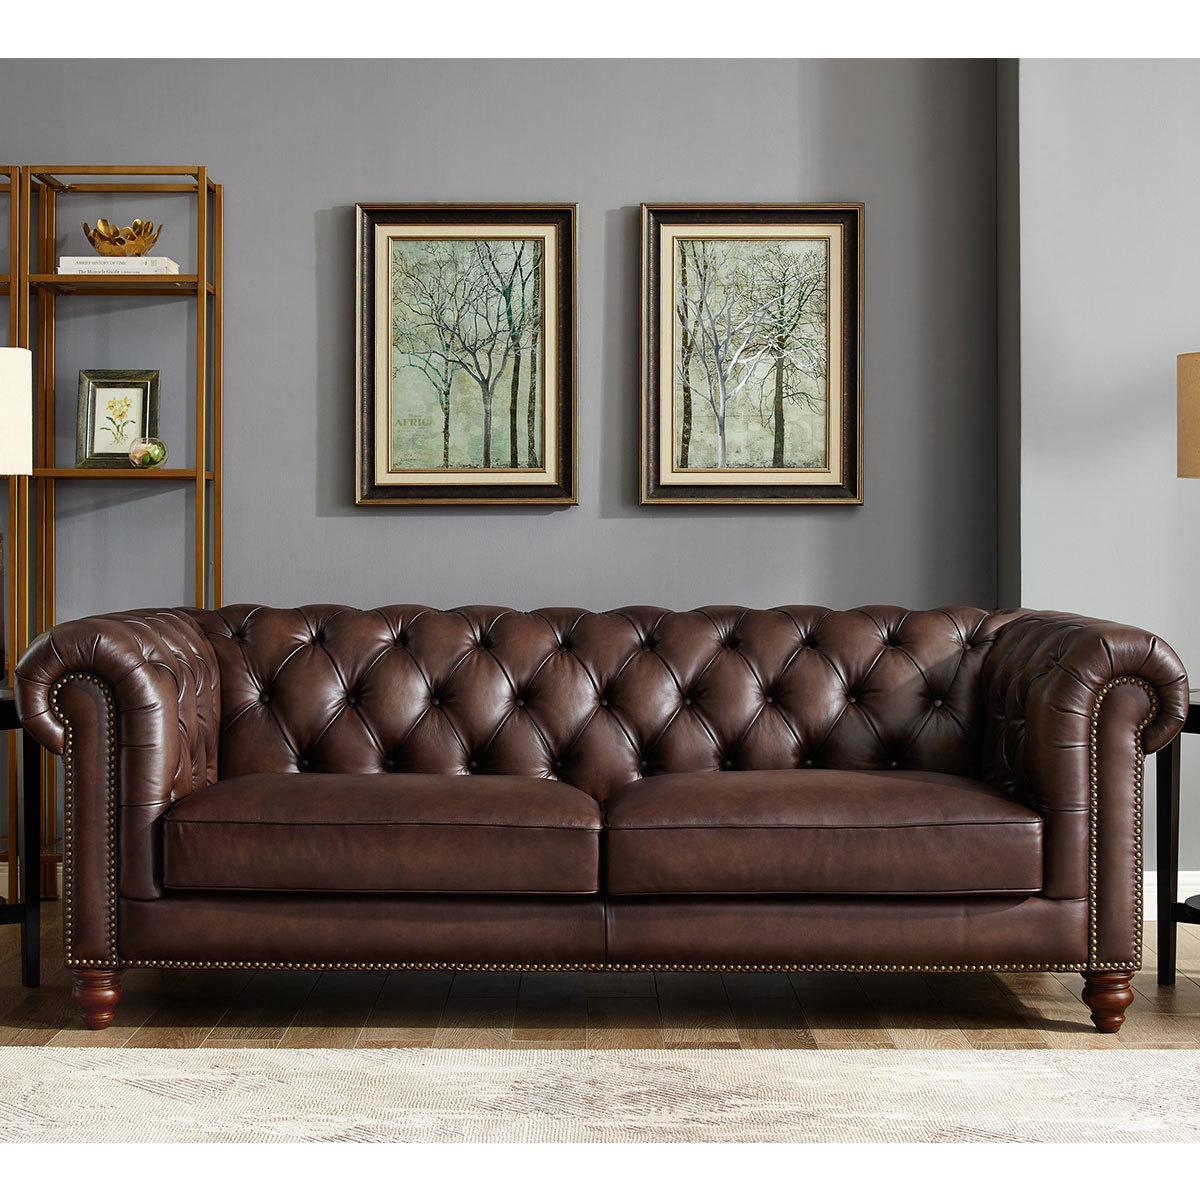 Allington 3 Seater Brown Leather Chesterfield Sofa Costco Uk